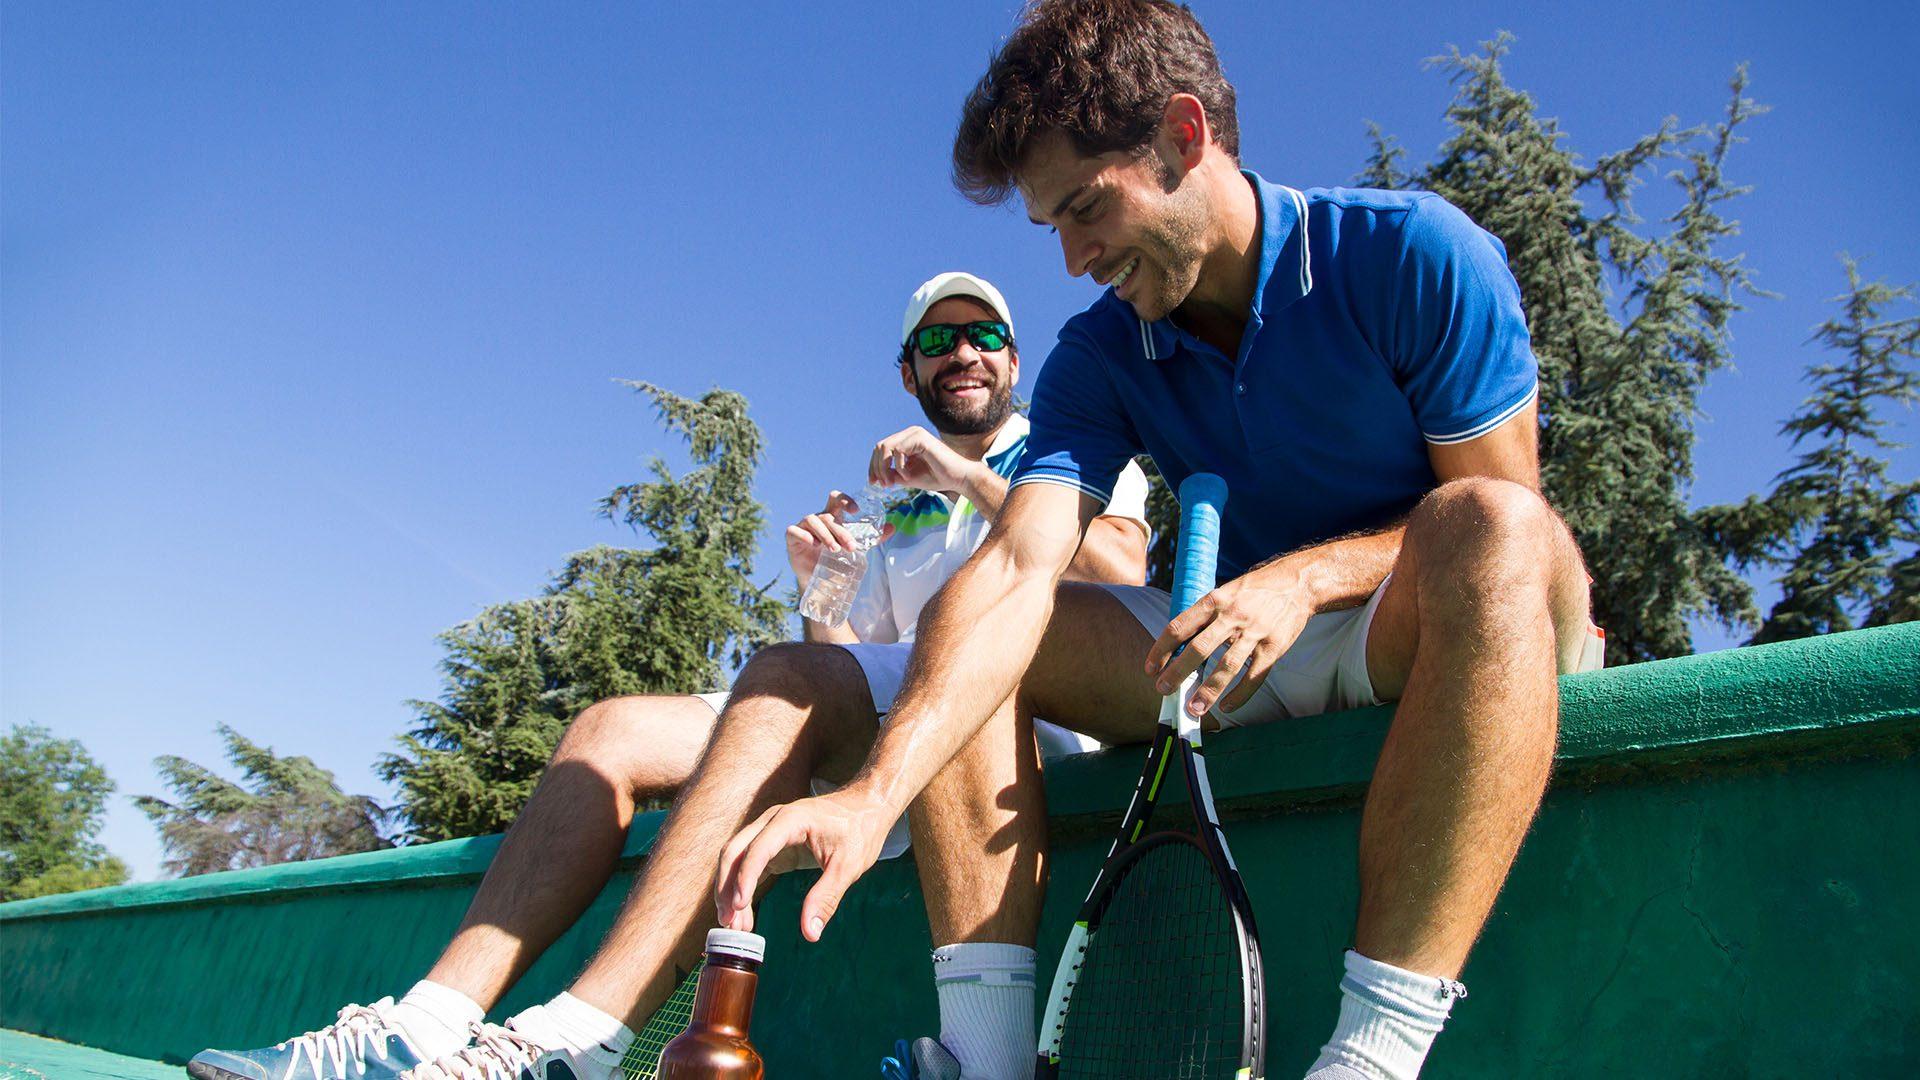 Two male tennis players taking a break